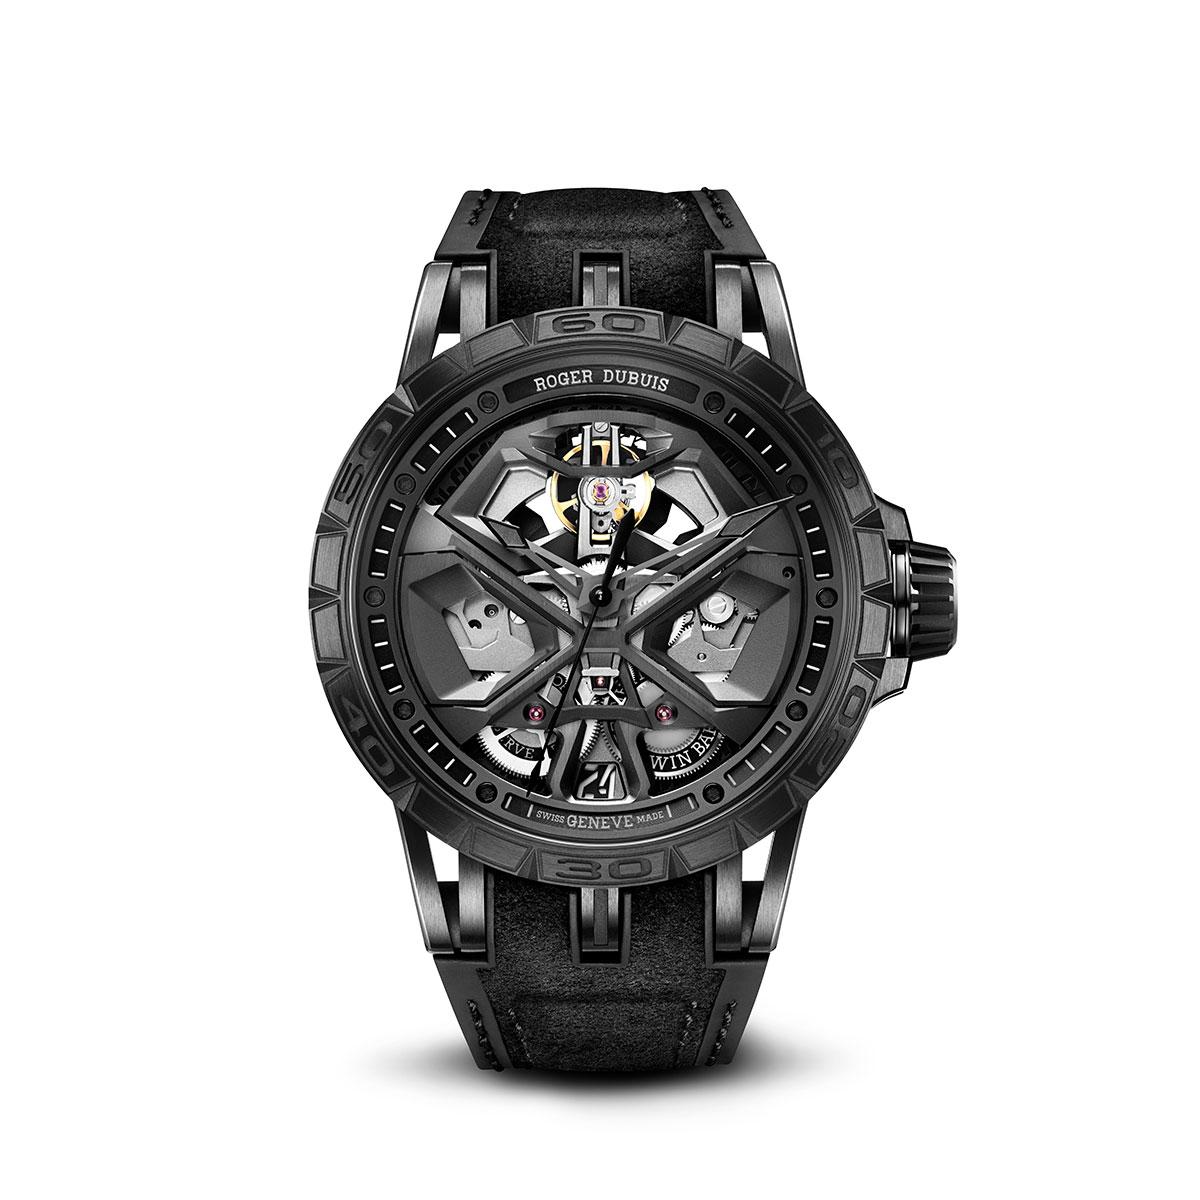 Roger Dubuis Excalibur Spider Huracan Watch